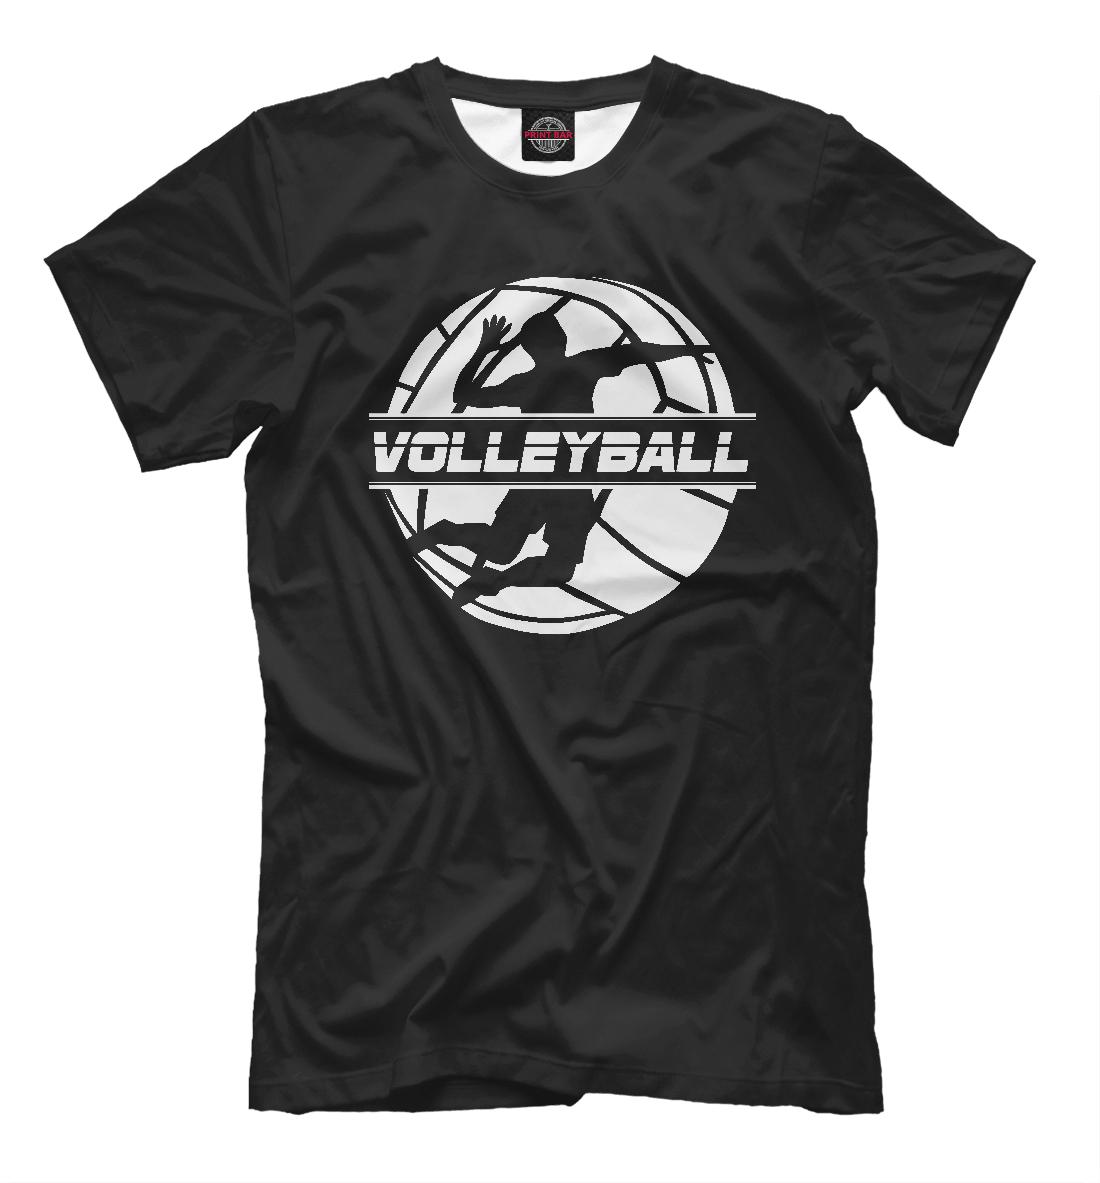 Футболка Volleyball (166204)